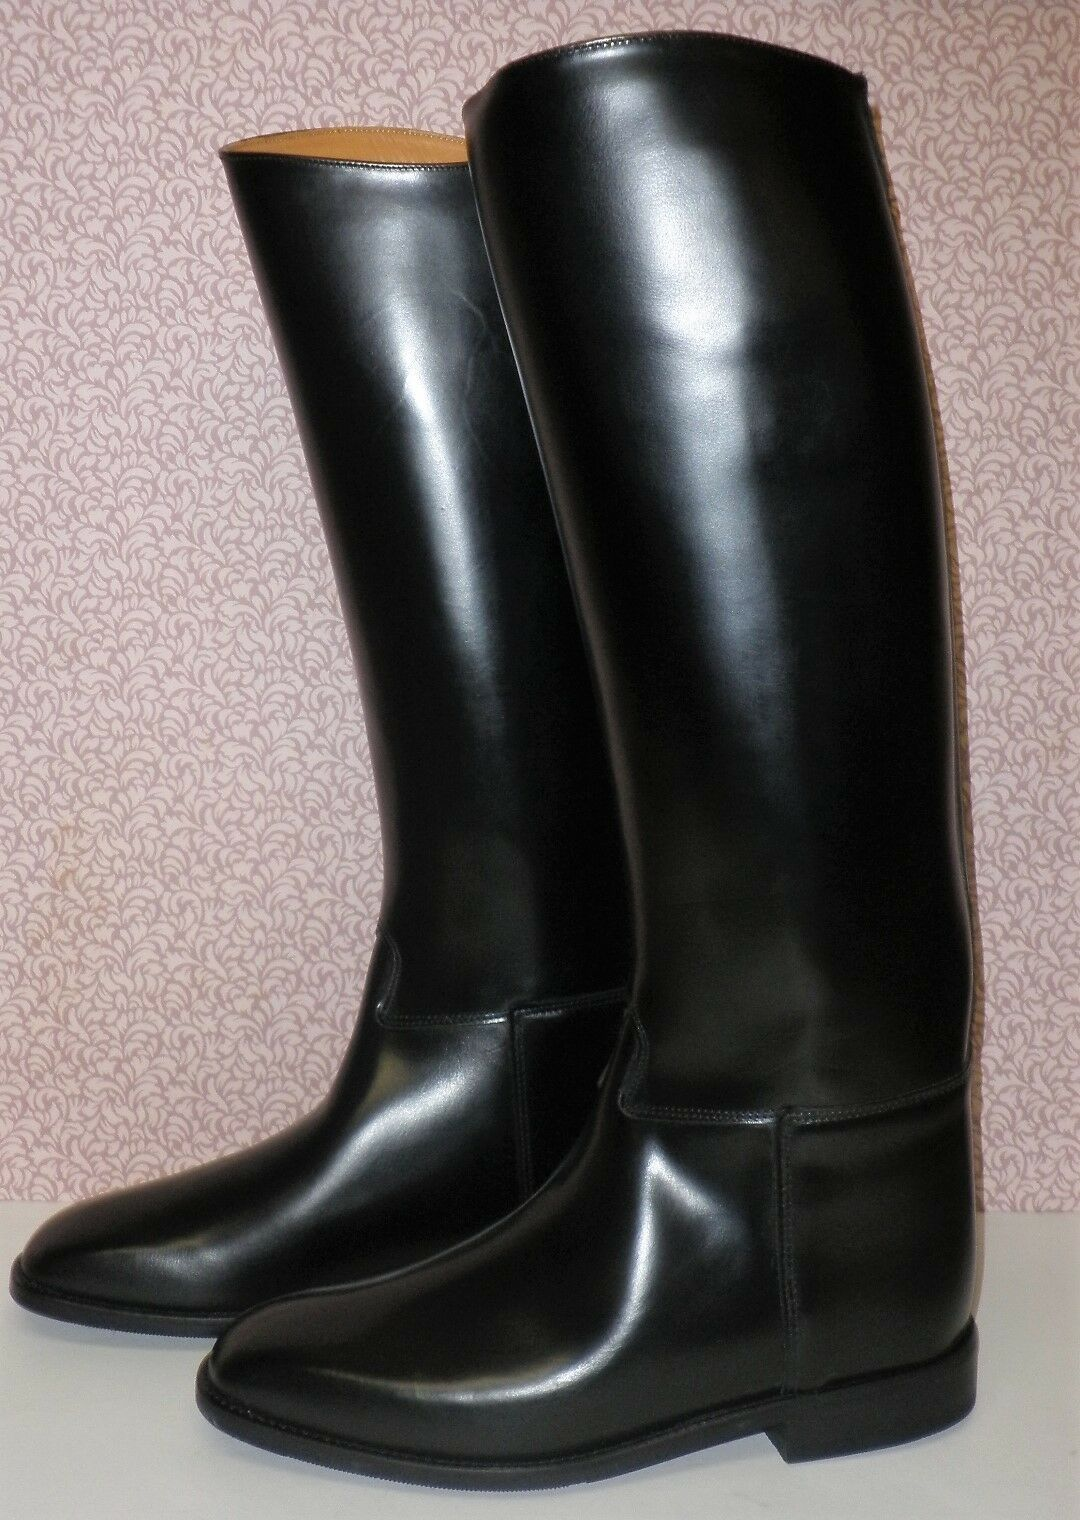 Regent Europa zwart Leer Riding laarzen --afmeting 3 In diverse lengte &m Calf afmetings